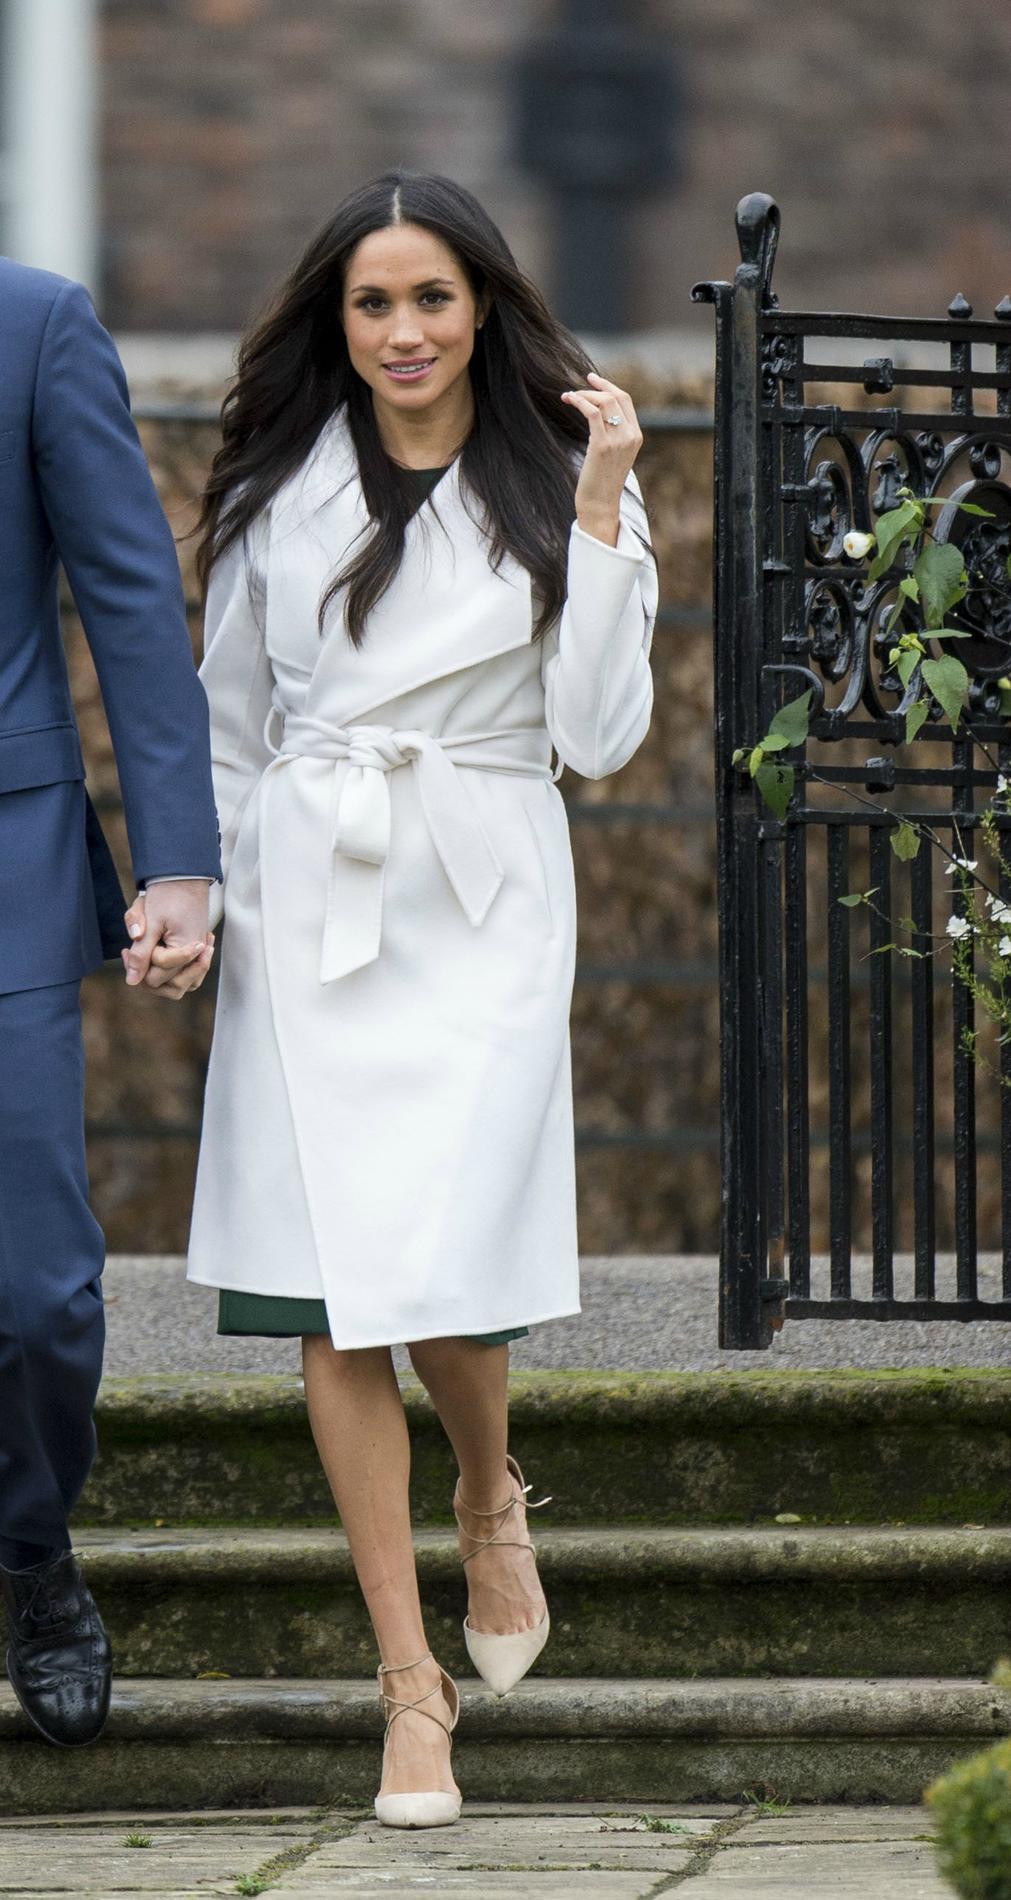 f2bda359cb3 ... Markle   une Kate Middleton à l américaine - Tapis rouge Meghan Markle    une Kate Middleton à l américaine - La star Meghan Markle   une Kate  Middleton ...